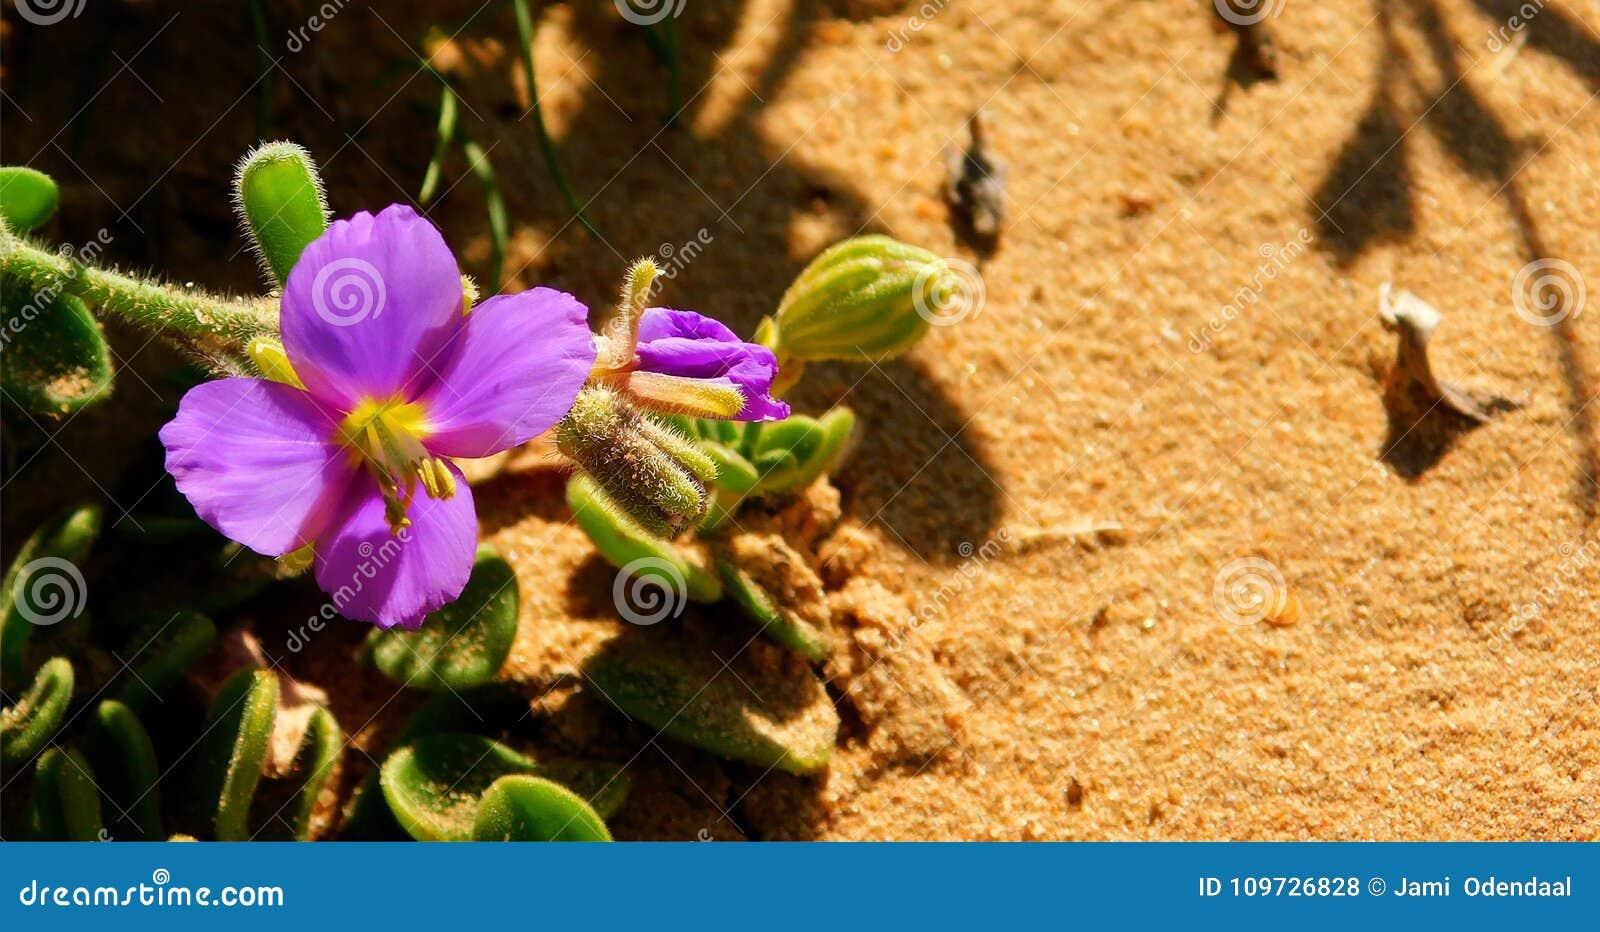 Purple Flower On Sand Stock Photo Image Of Yellow Shadows 109726828